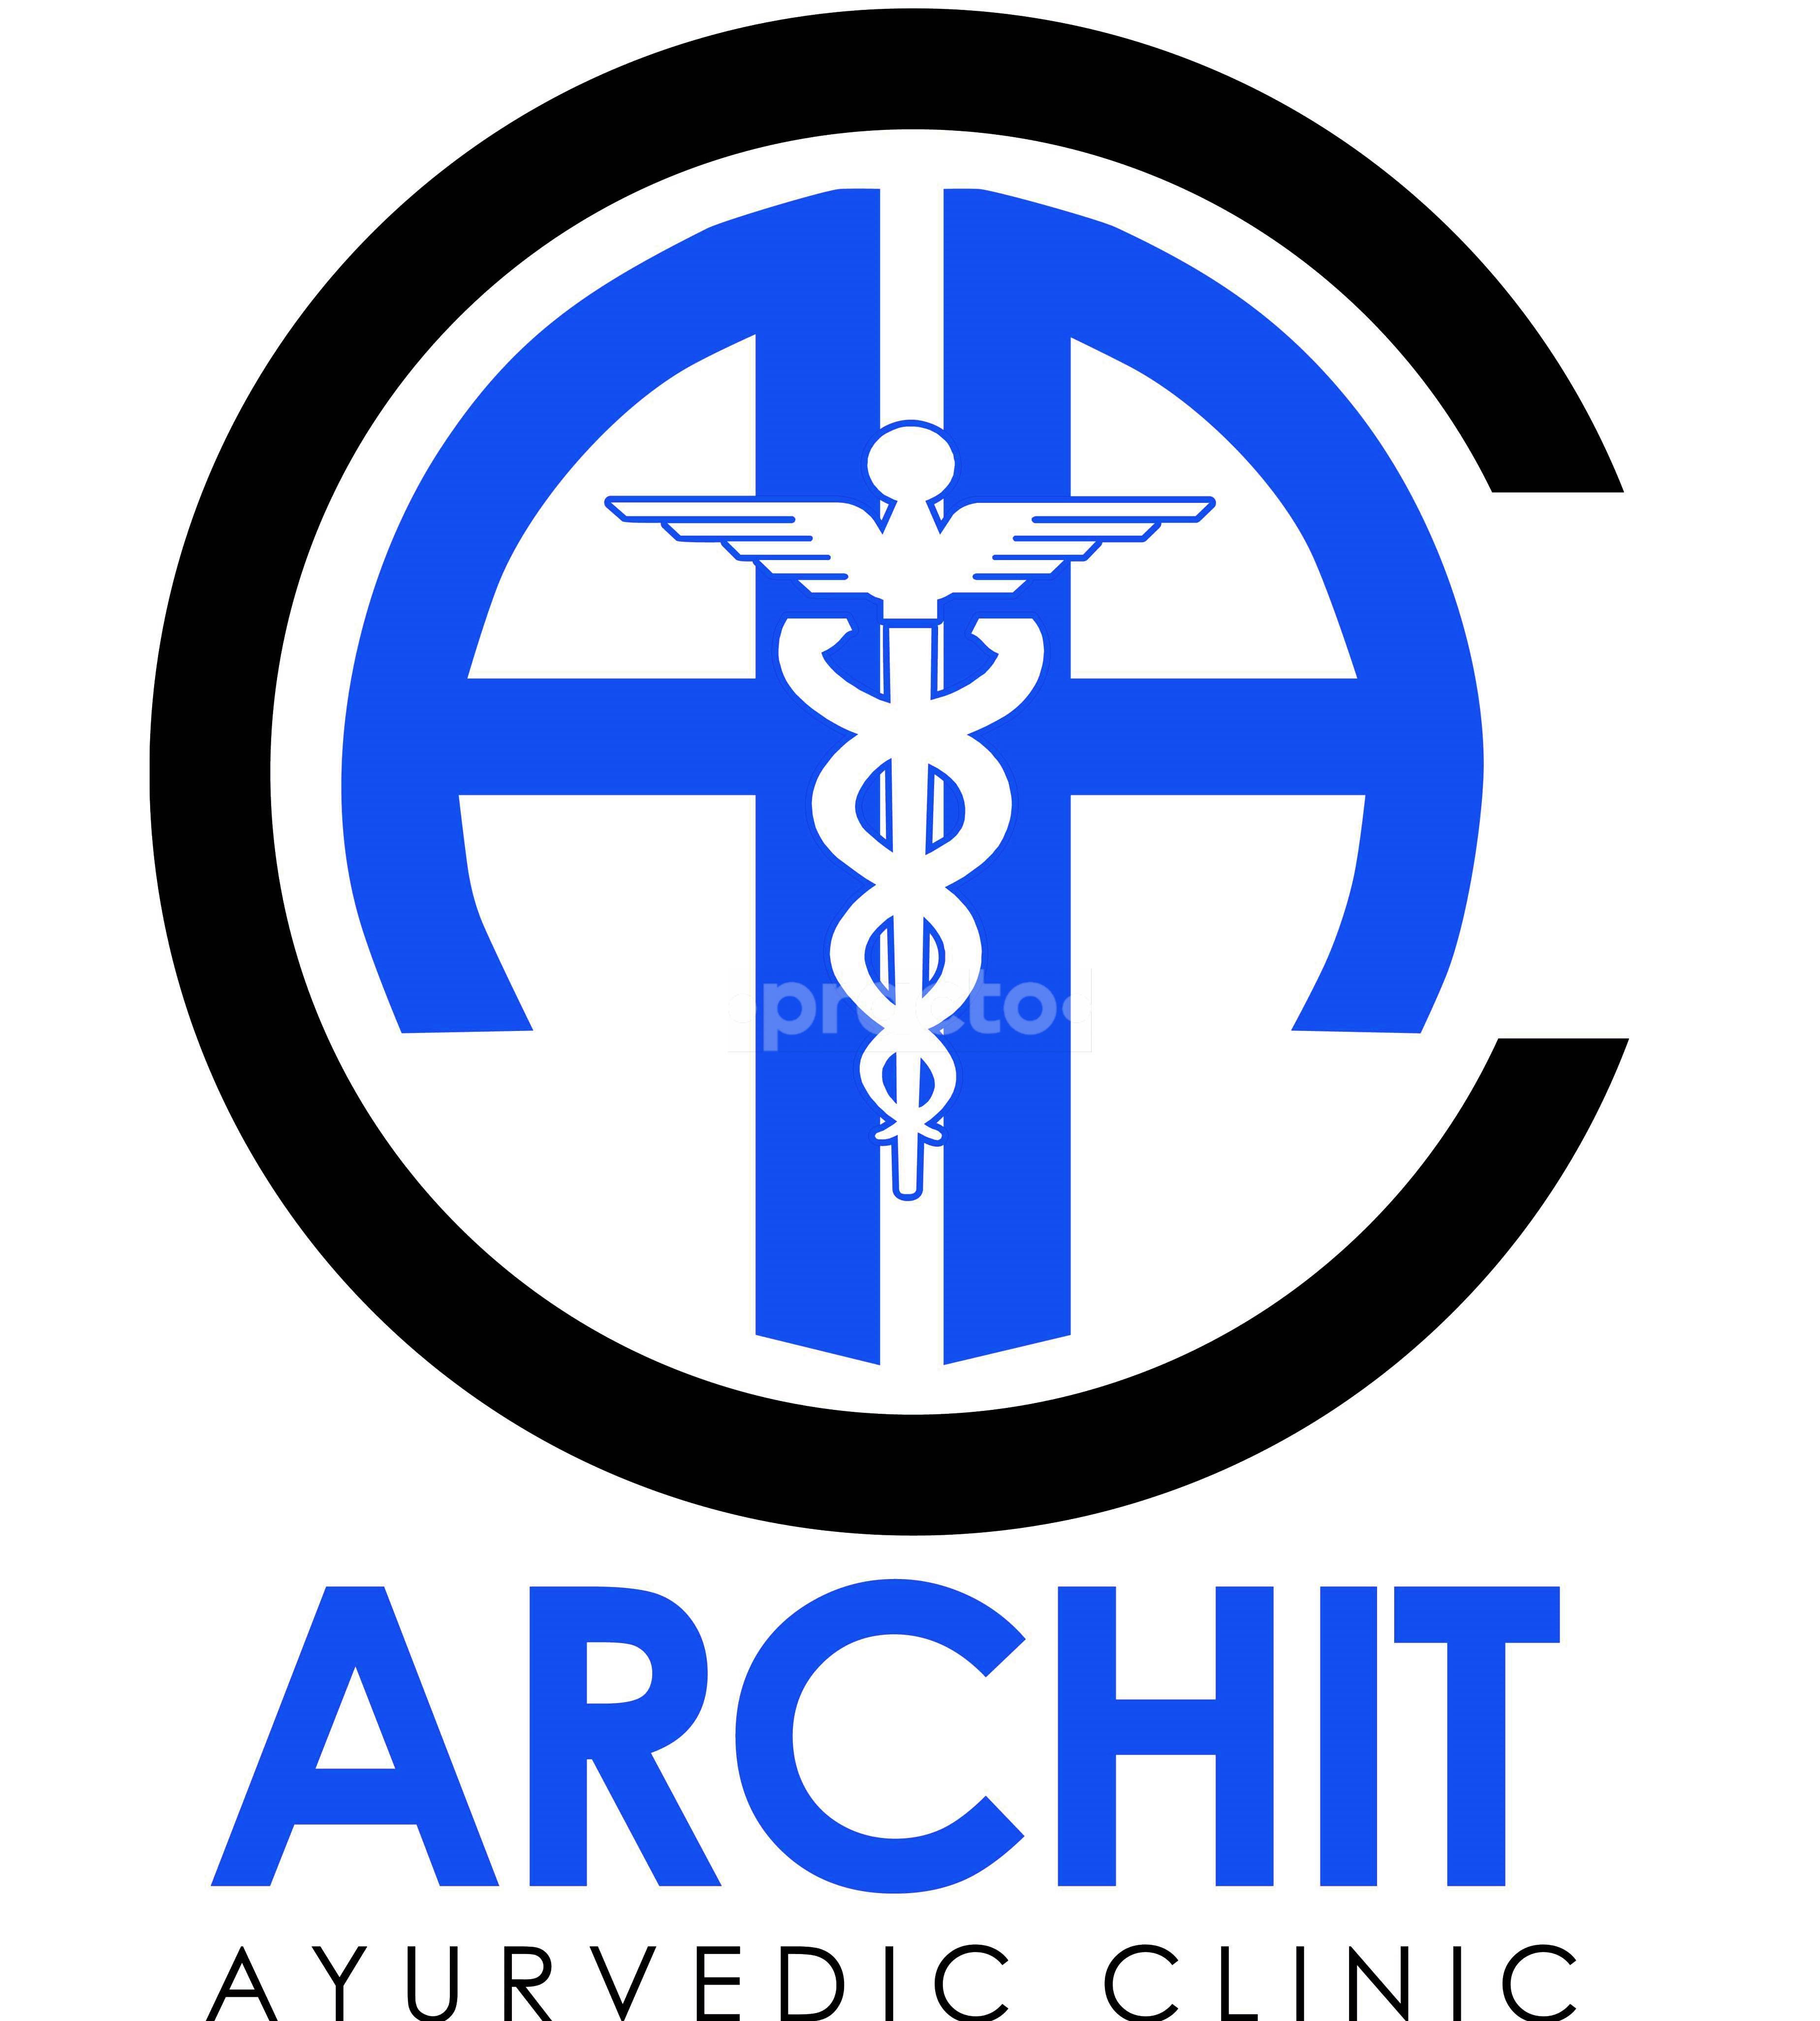 Archit Ayurvedic Clinic